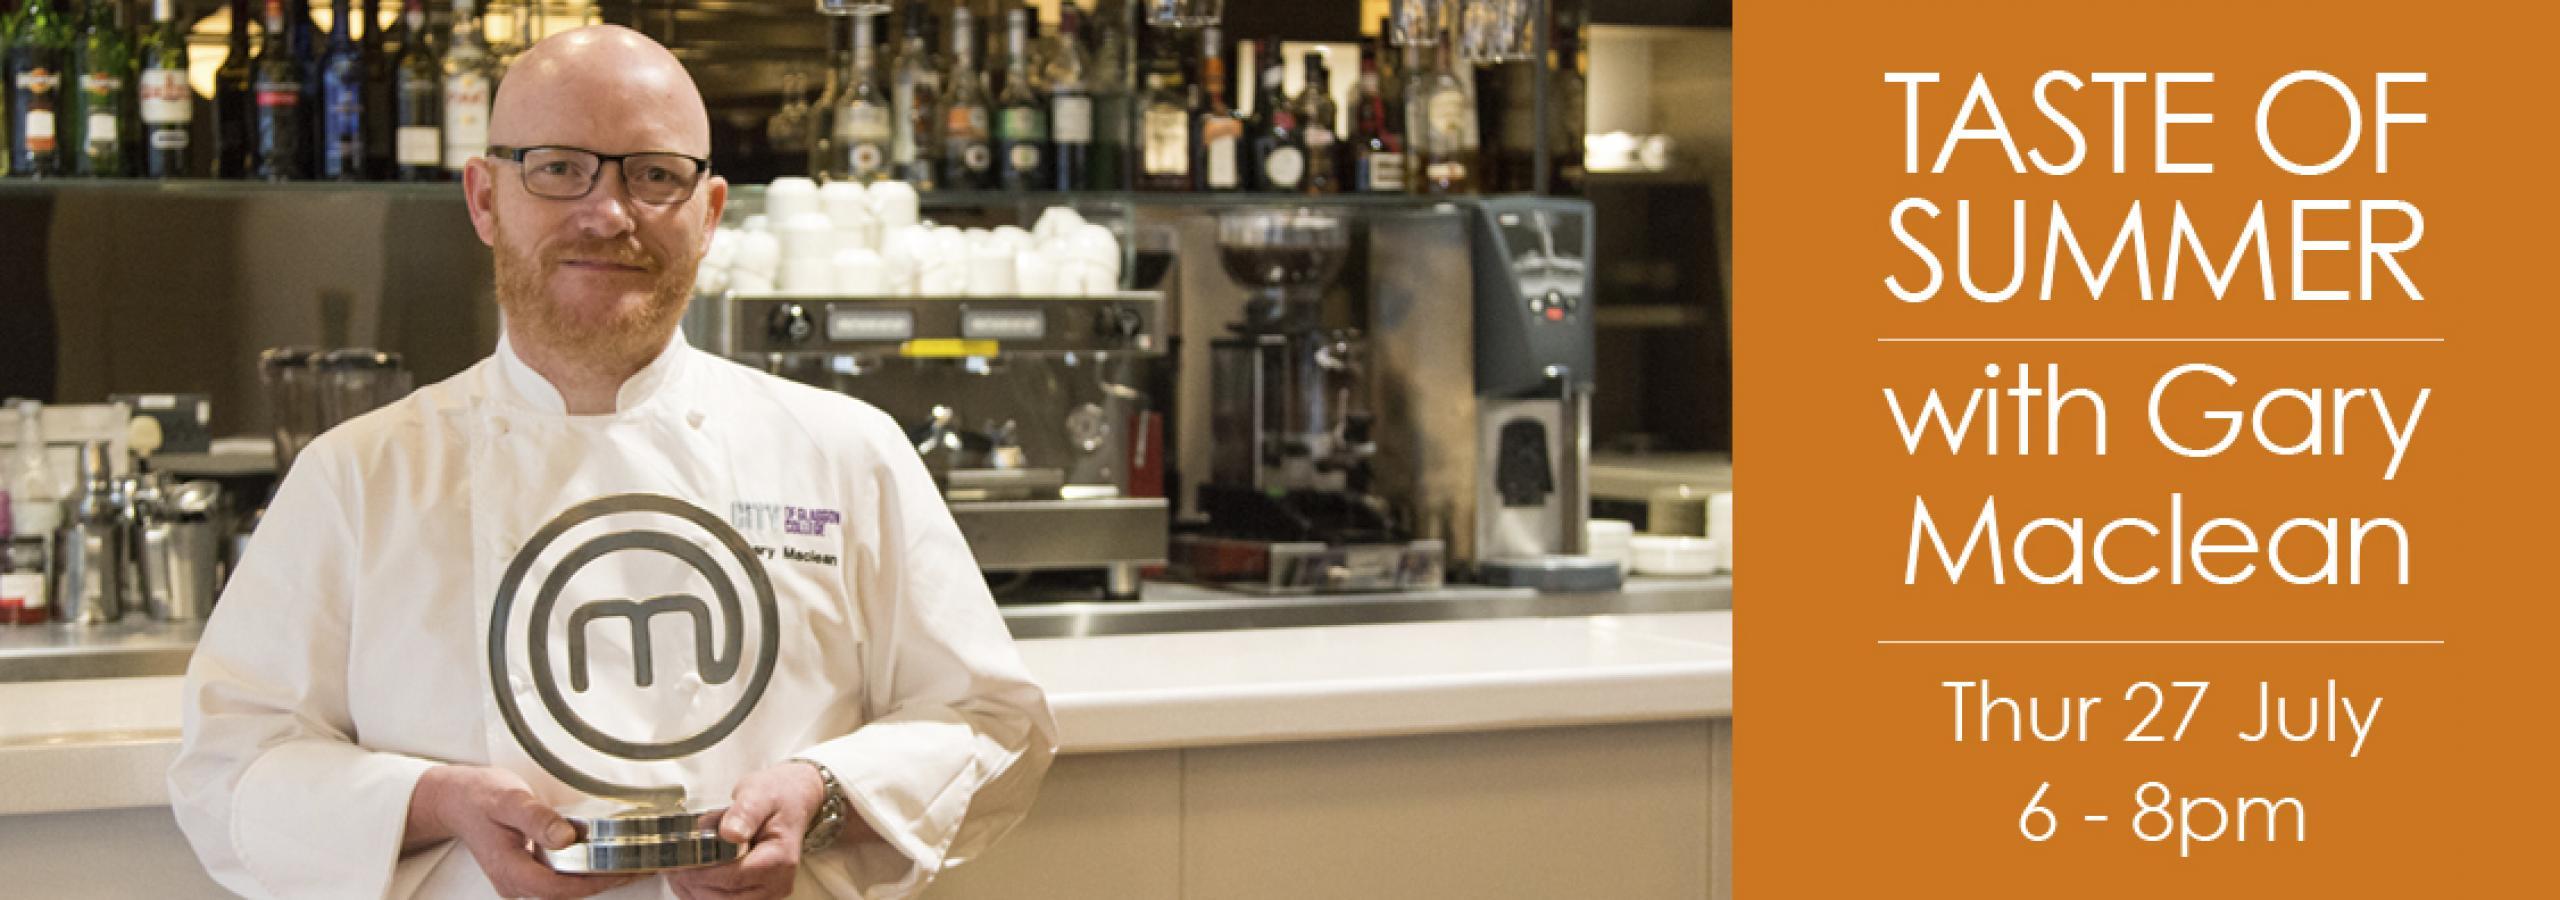 Gary Maclean Chef Masterclass